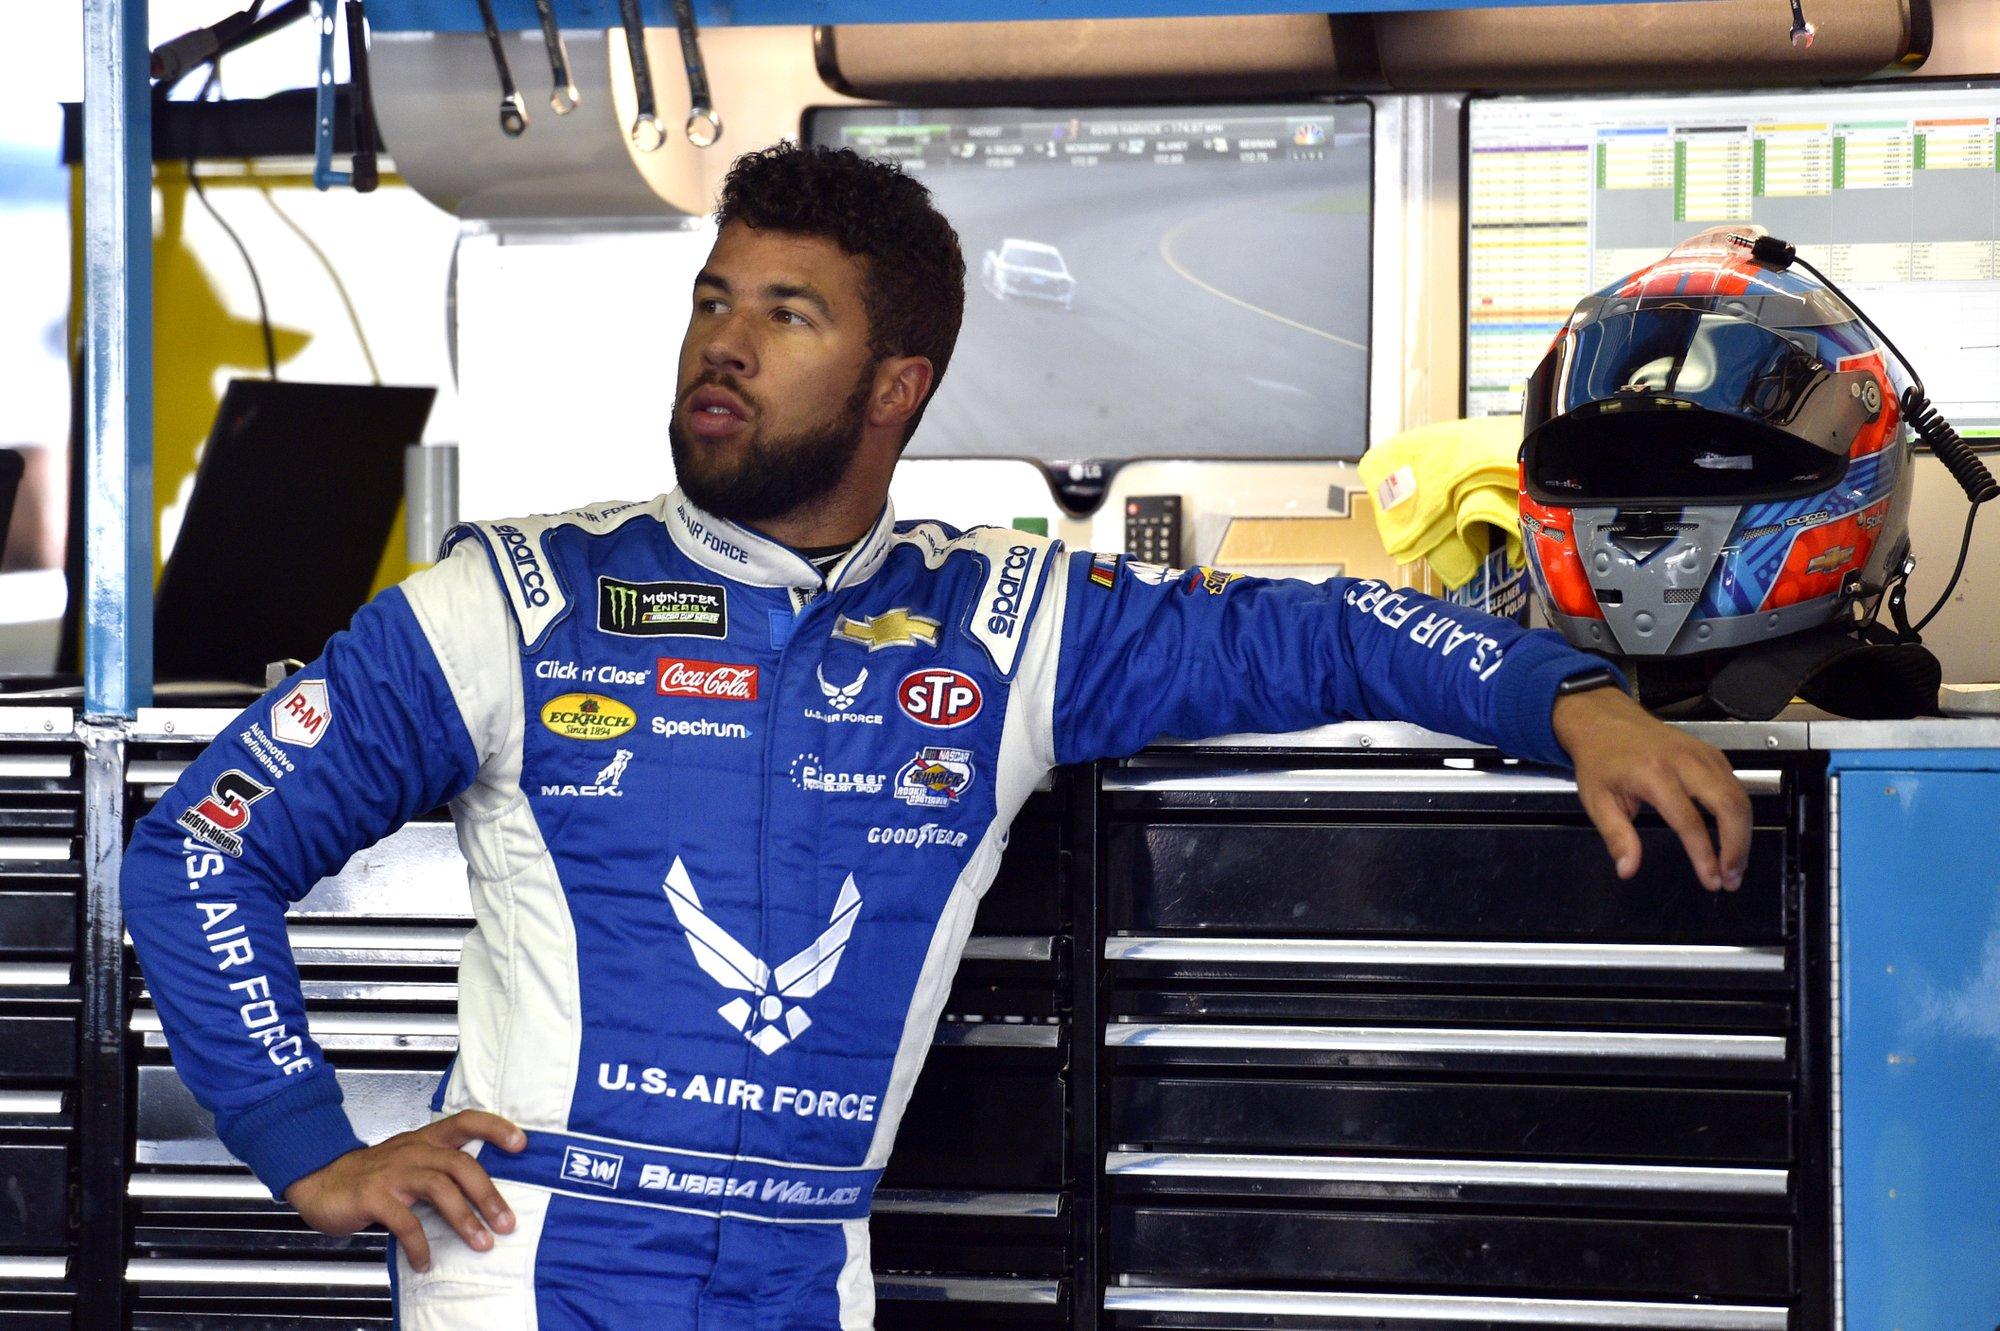 apnews.com - Jenna Fryer - Bubba Wallace has sights on blazing more trails in NASCAR